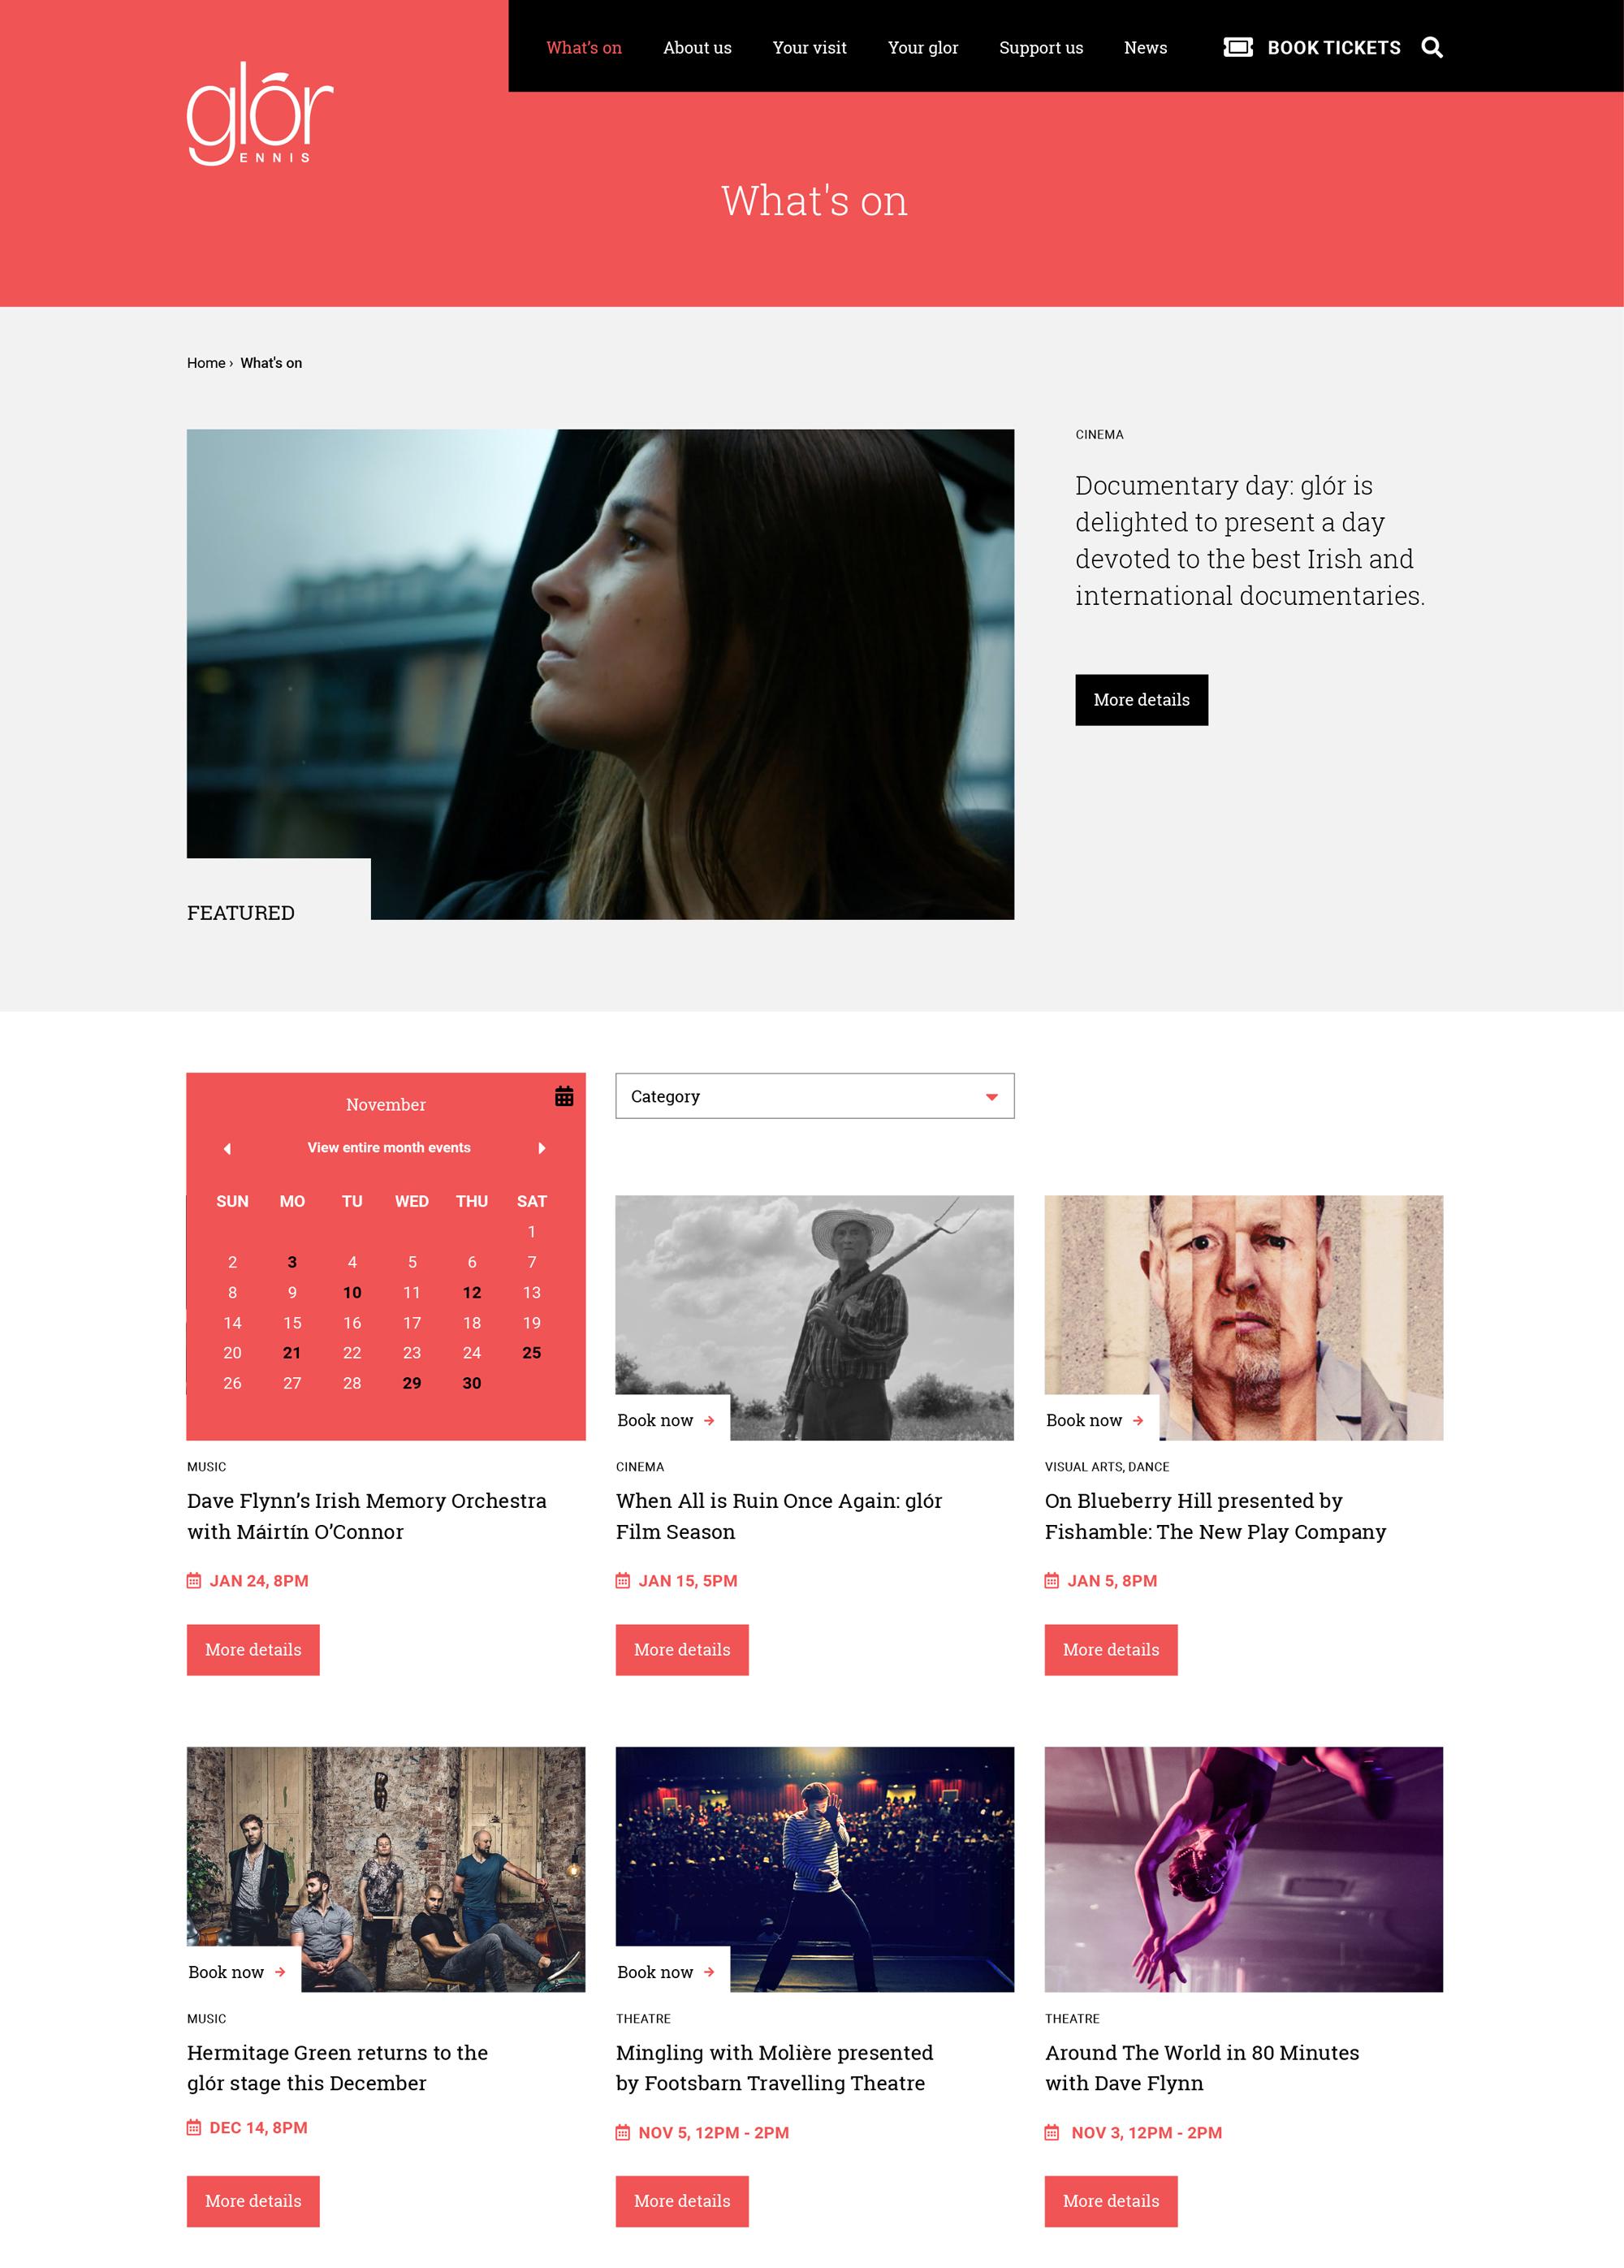 glor-website-development-7